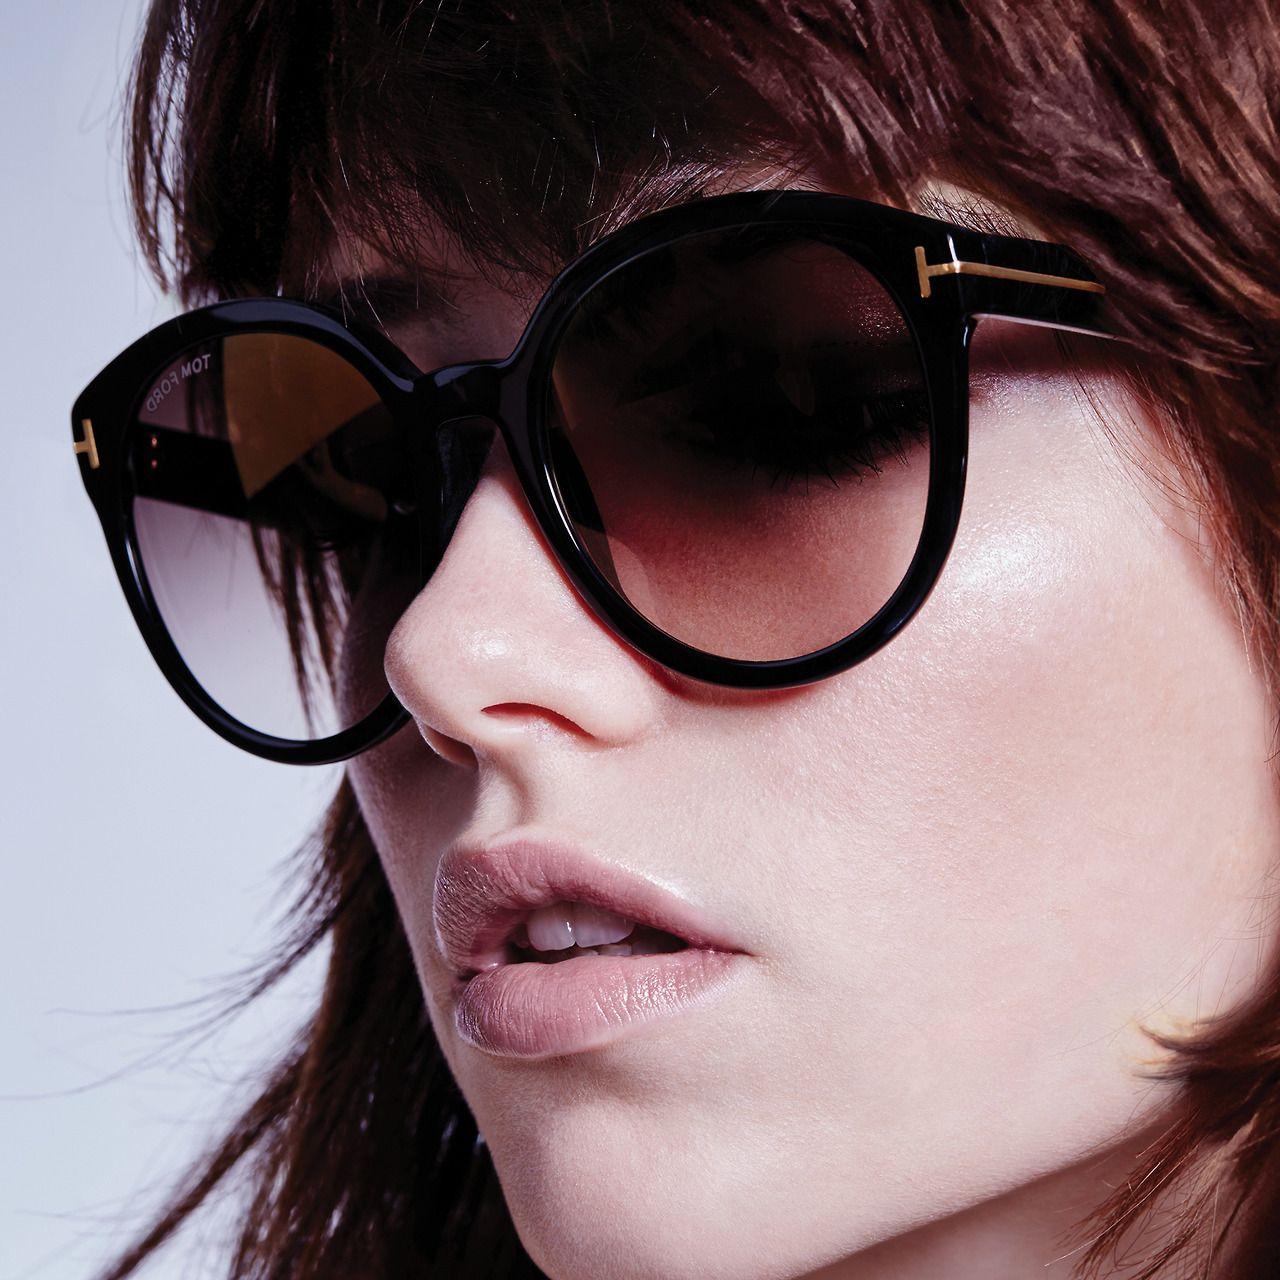 d3af9a6e8eb TOM FORD - The Philippa Sunglasses. ...